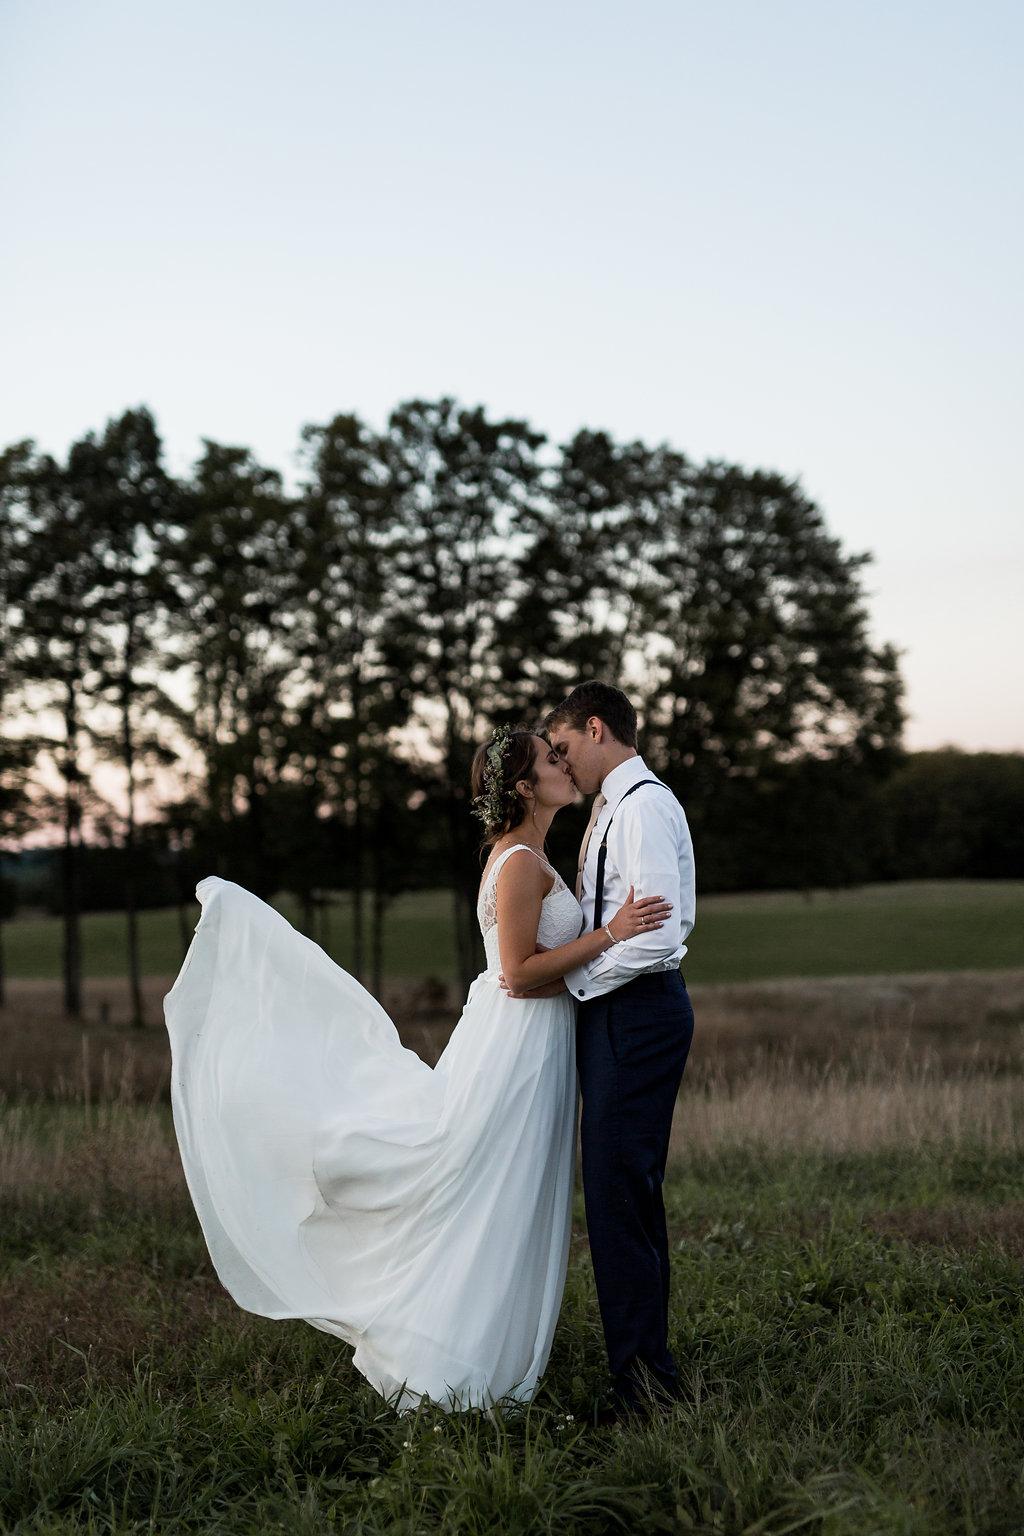 Sonshine_barn_northern_michigan_wedding_-106.jpg